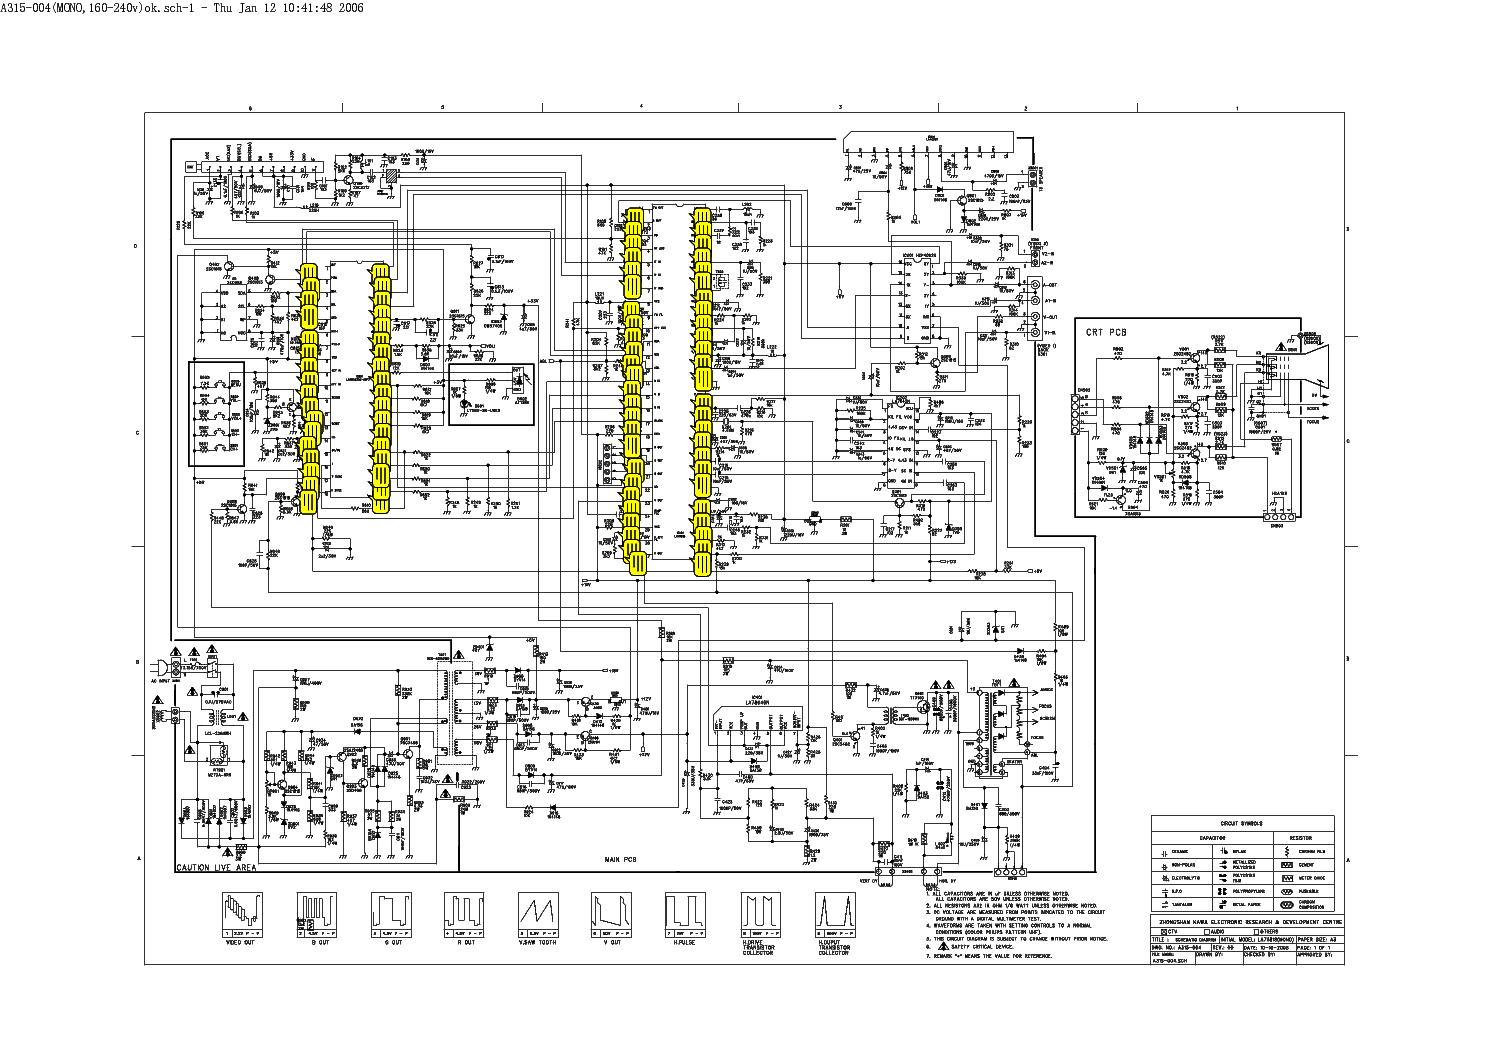 Электрическая схема телевизора акаи